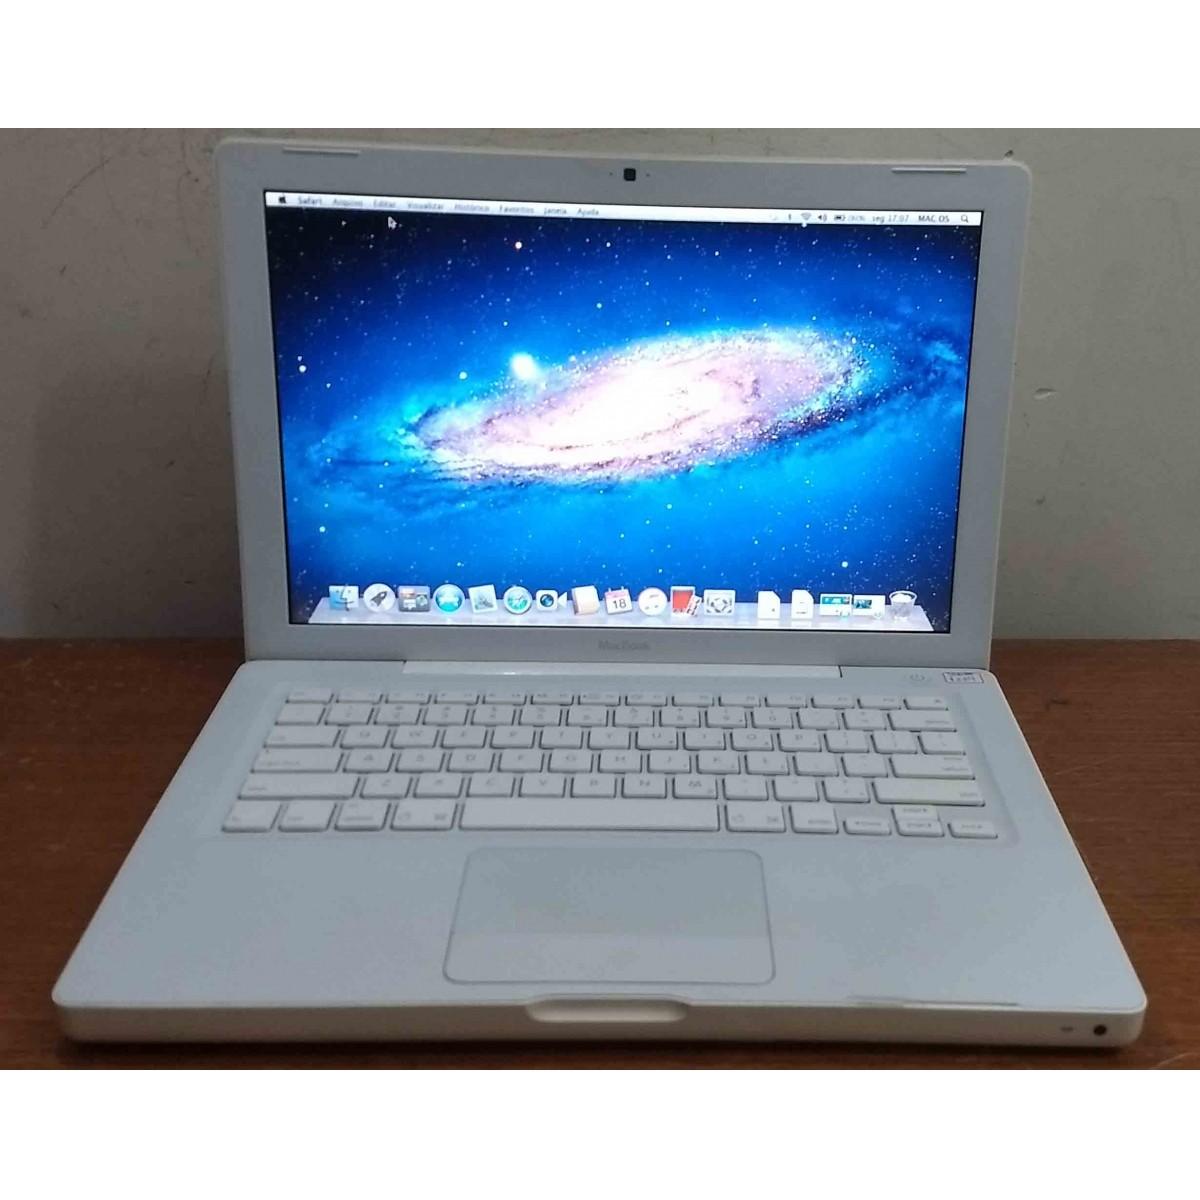 Macbook White MB061LL/A 13.3'' Intel Core 2 Duo 2GHz 4GB HD-250GB